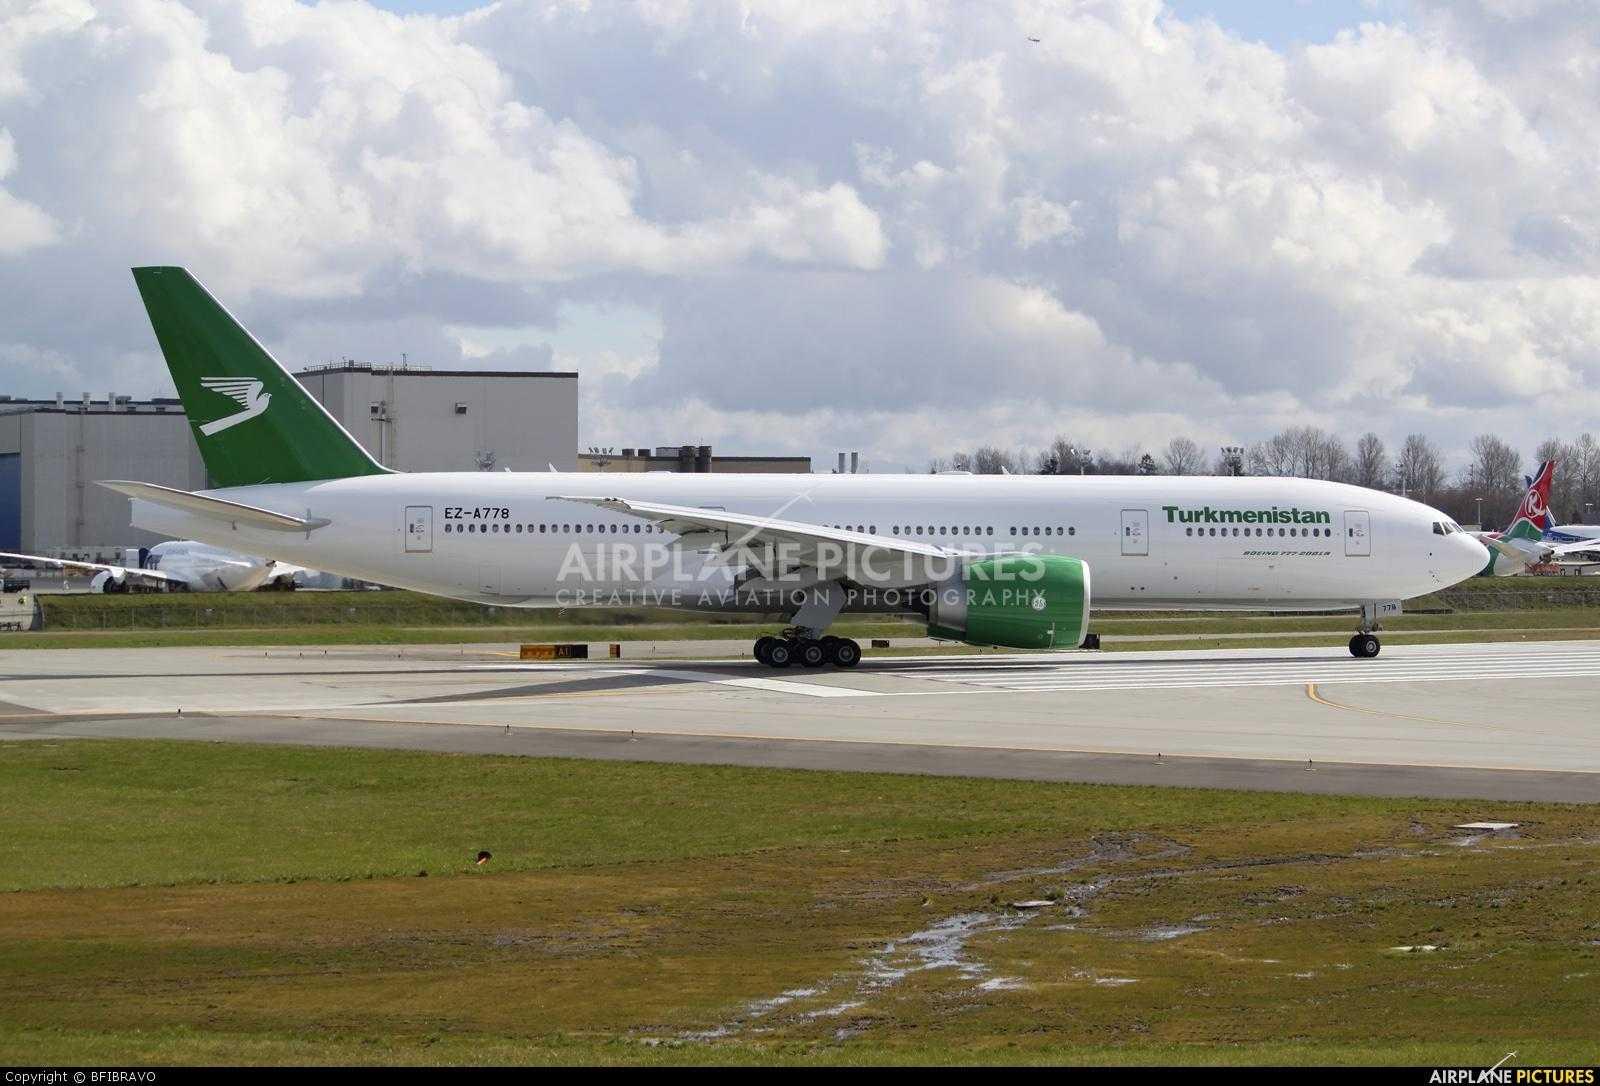 Boeing 777-200LR Turkmenistan